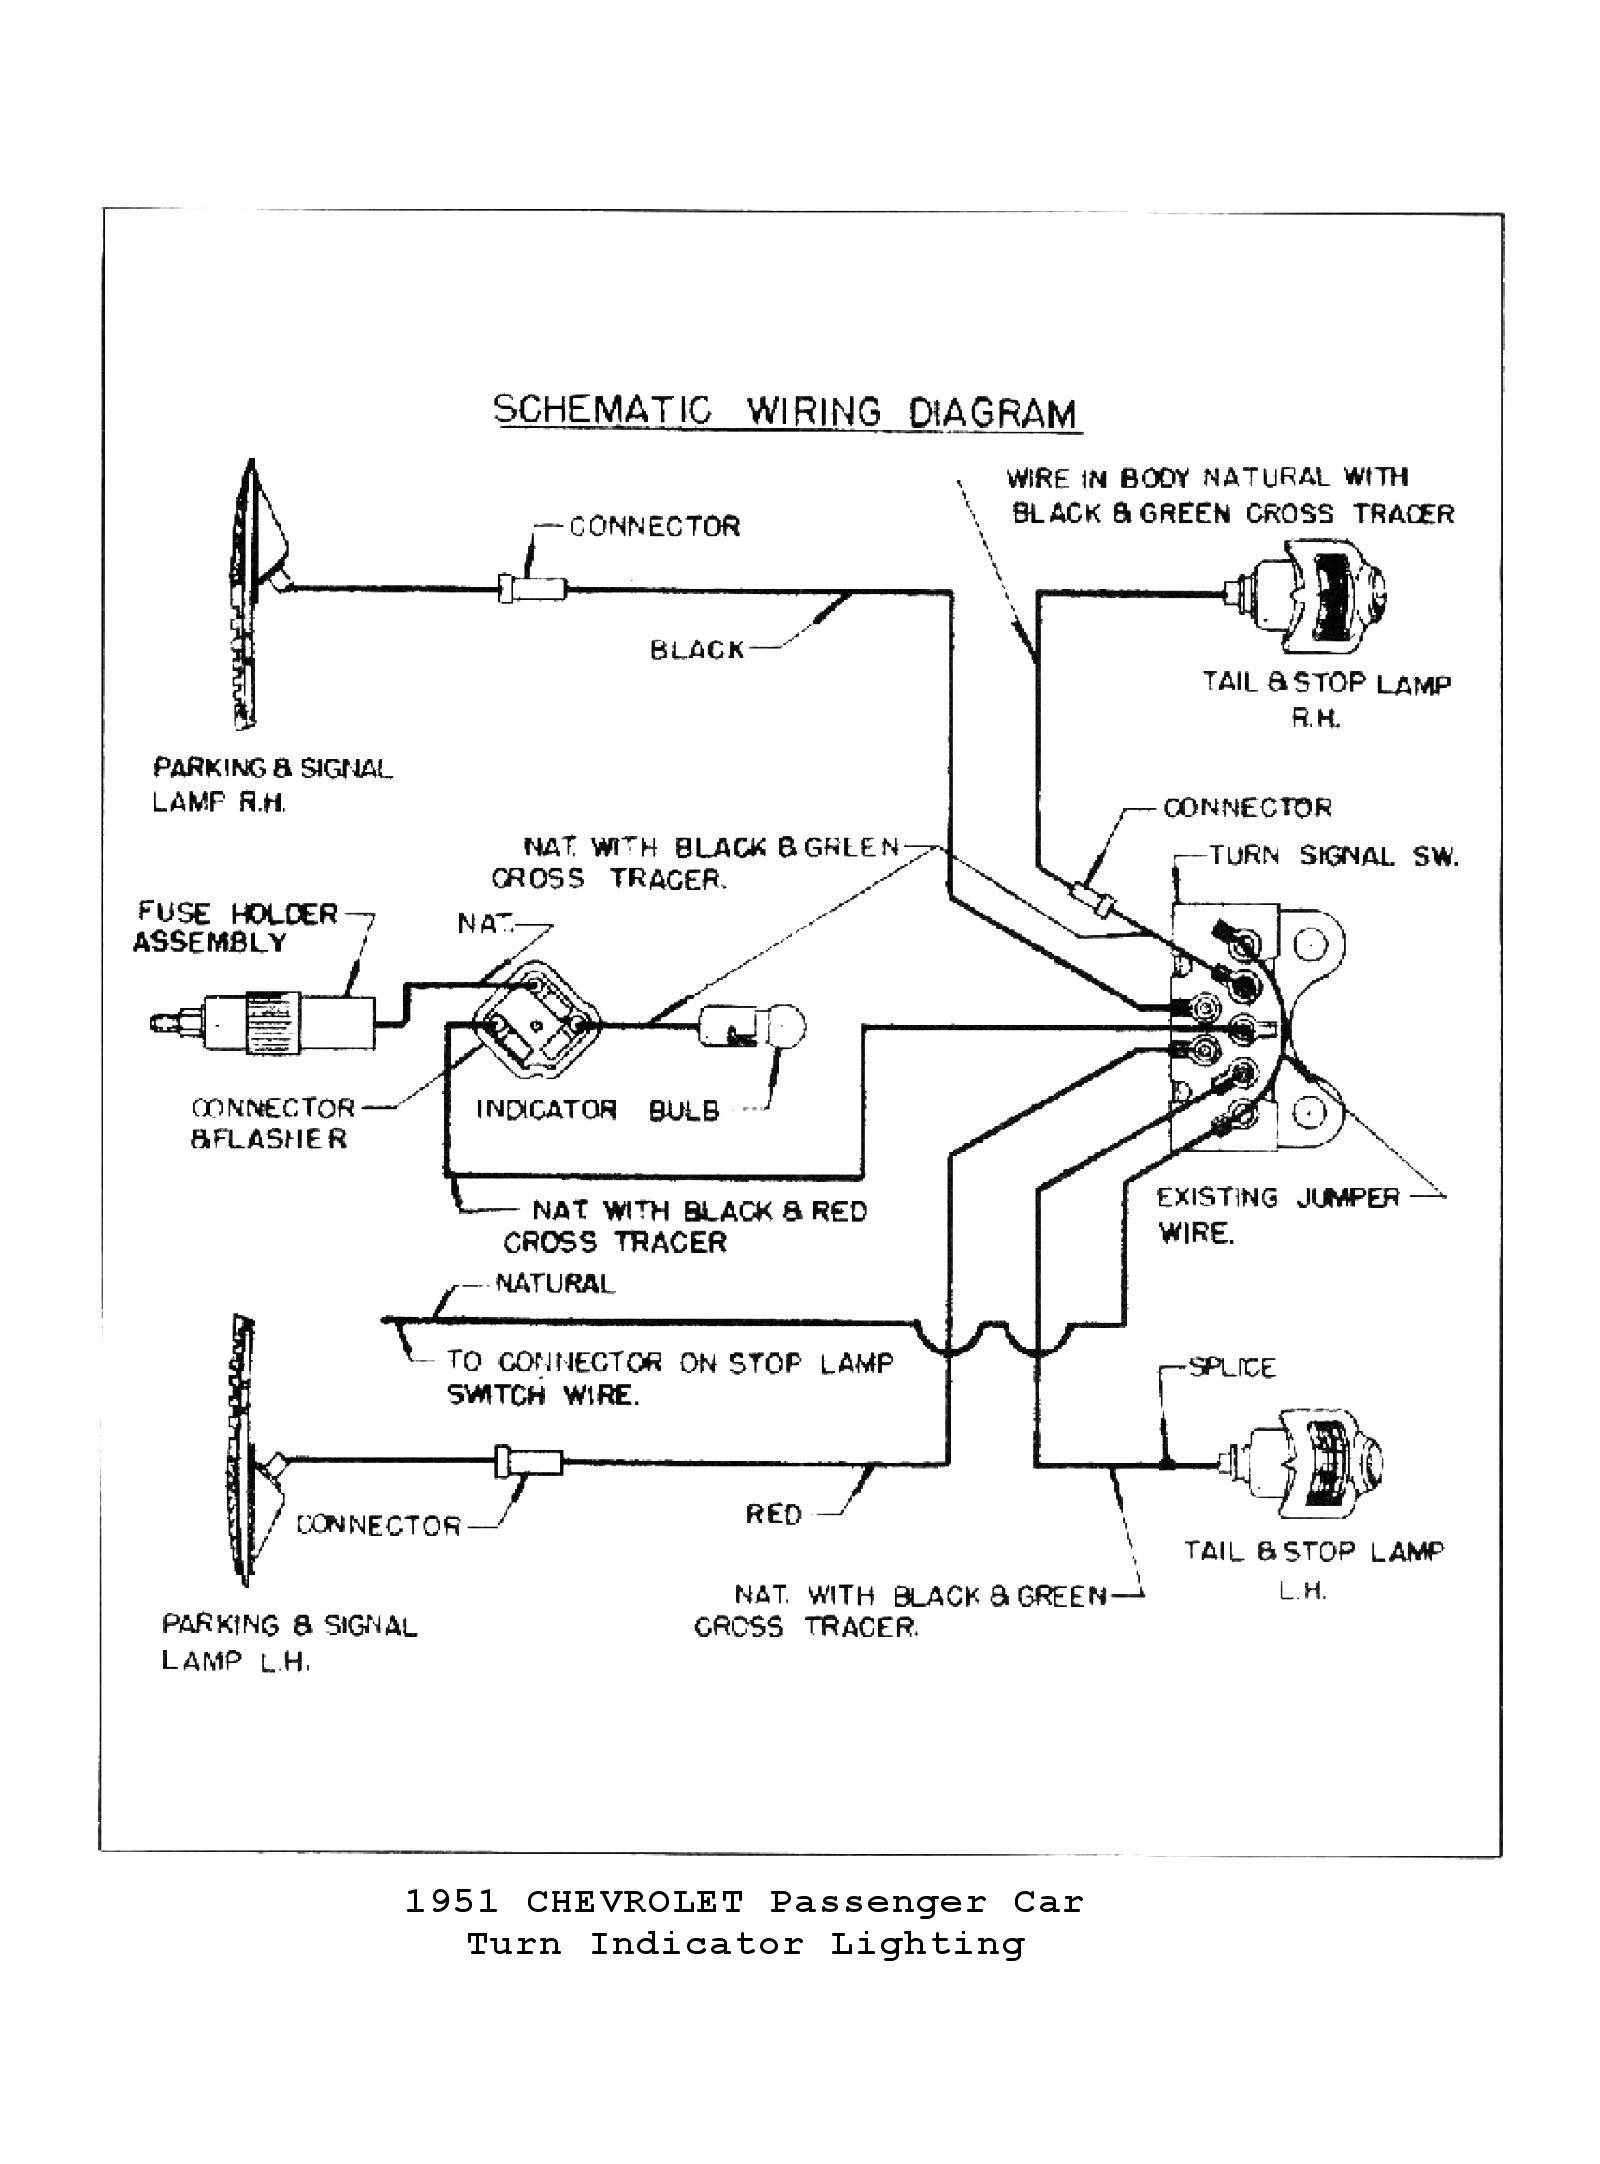 Chevy Turn Light Wiring Diagram | Wiring Diagram - Brake Light Wiring Diagram Chevy